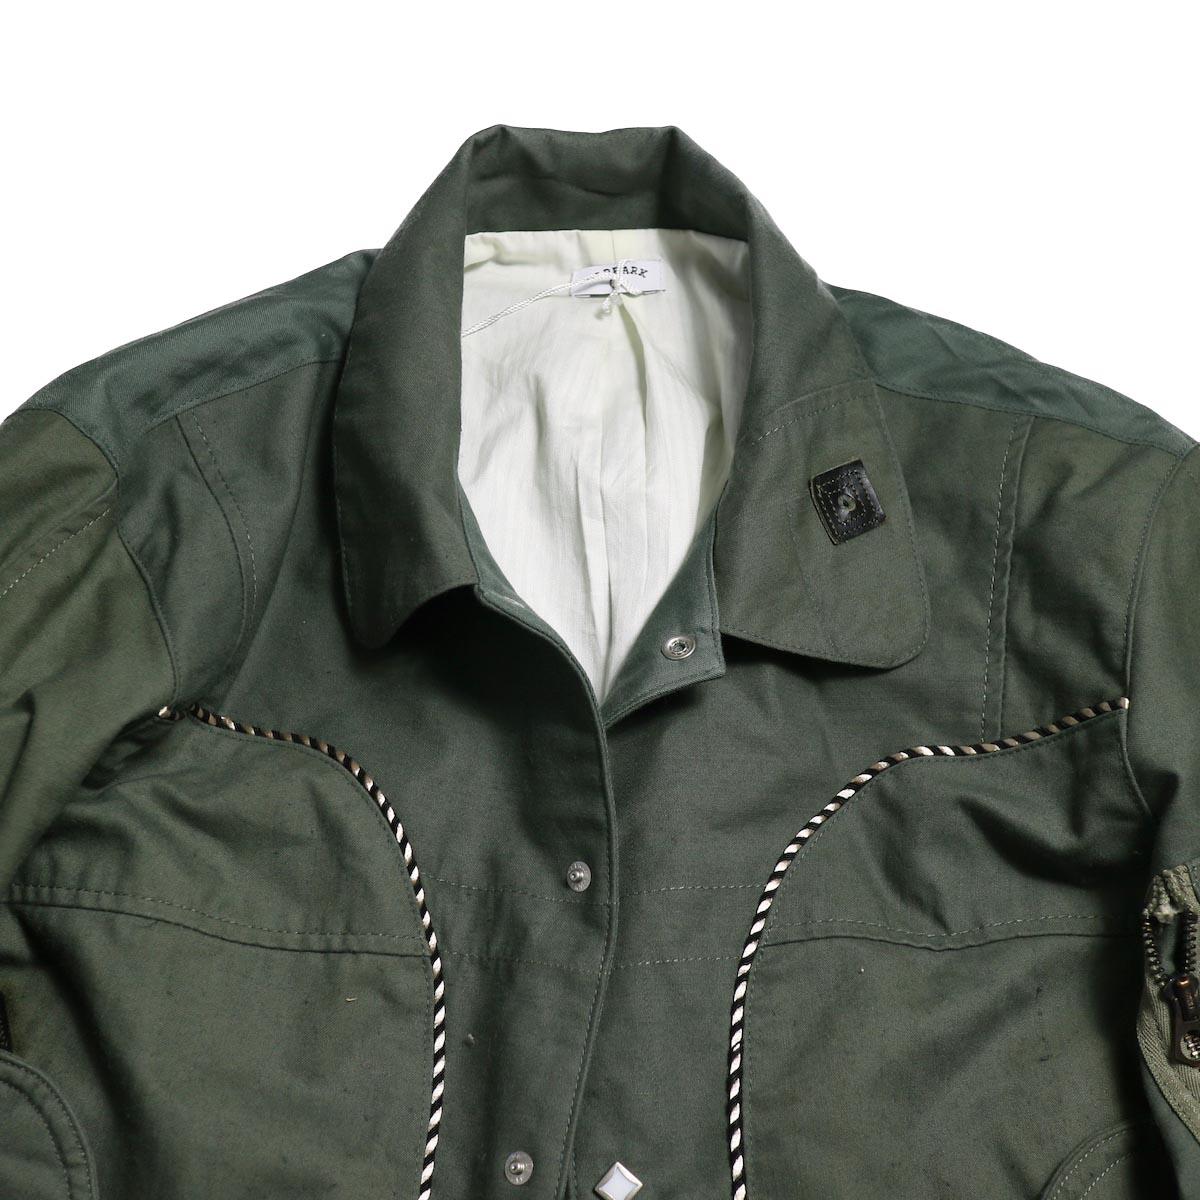 OLD PARK / Scarf Cardigan Burberry (Beige)左裾